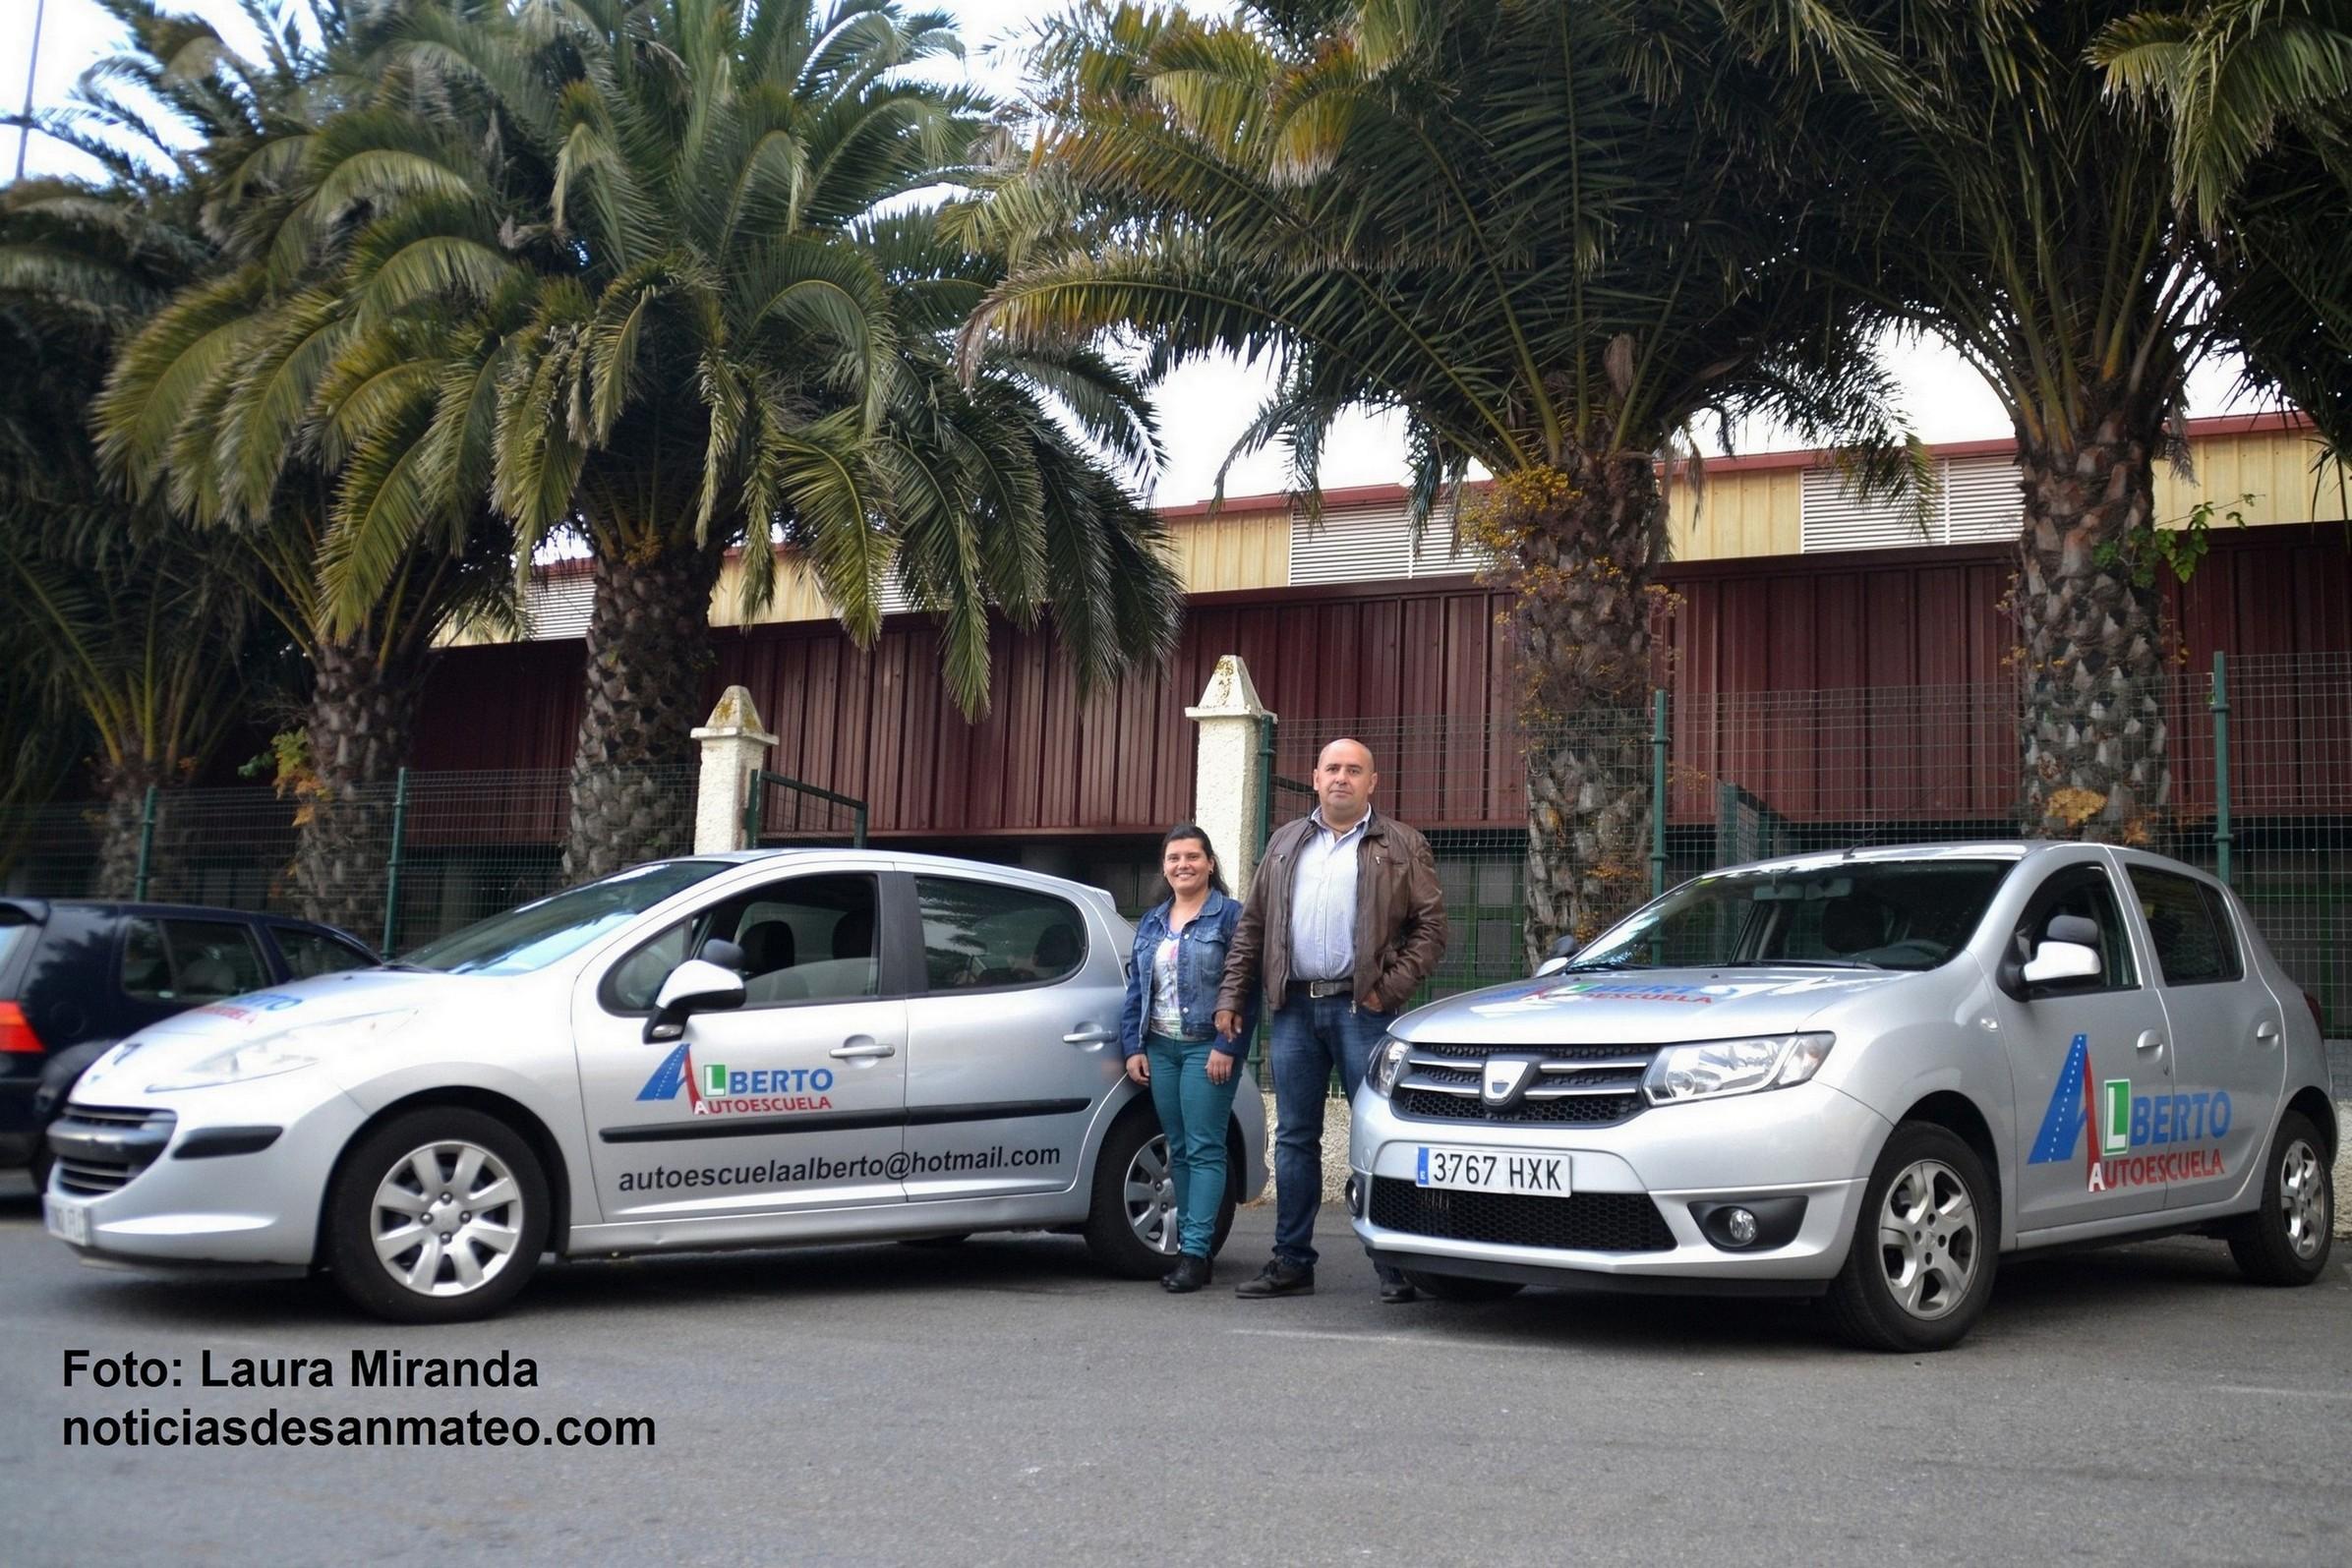 Autoescuela Alberto segundo aniversario Foto Laura Miranda